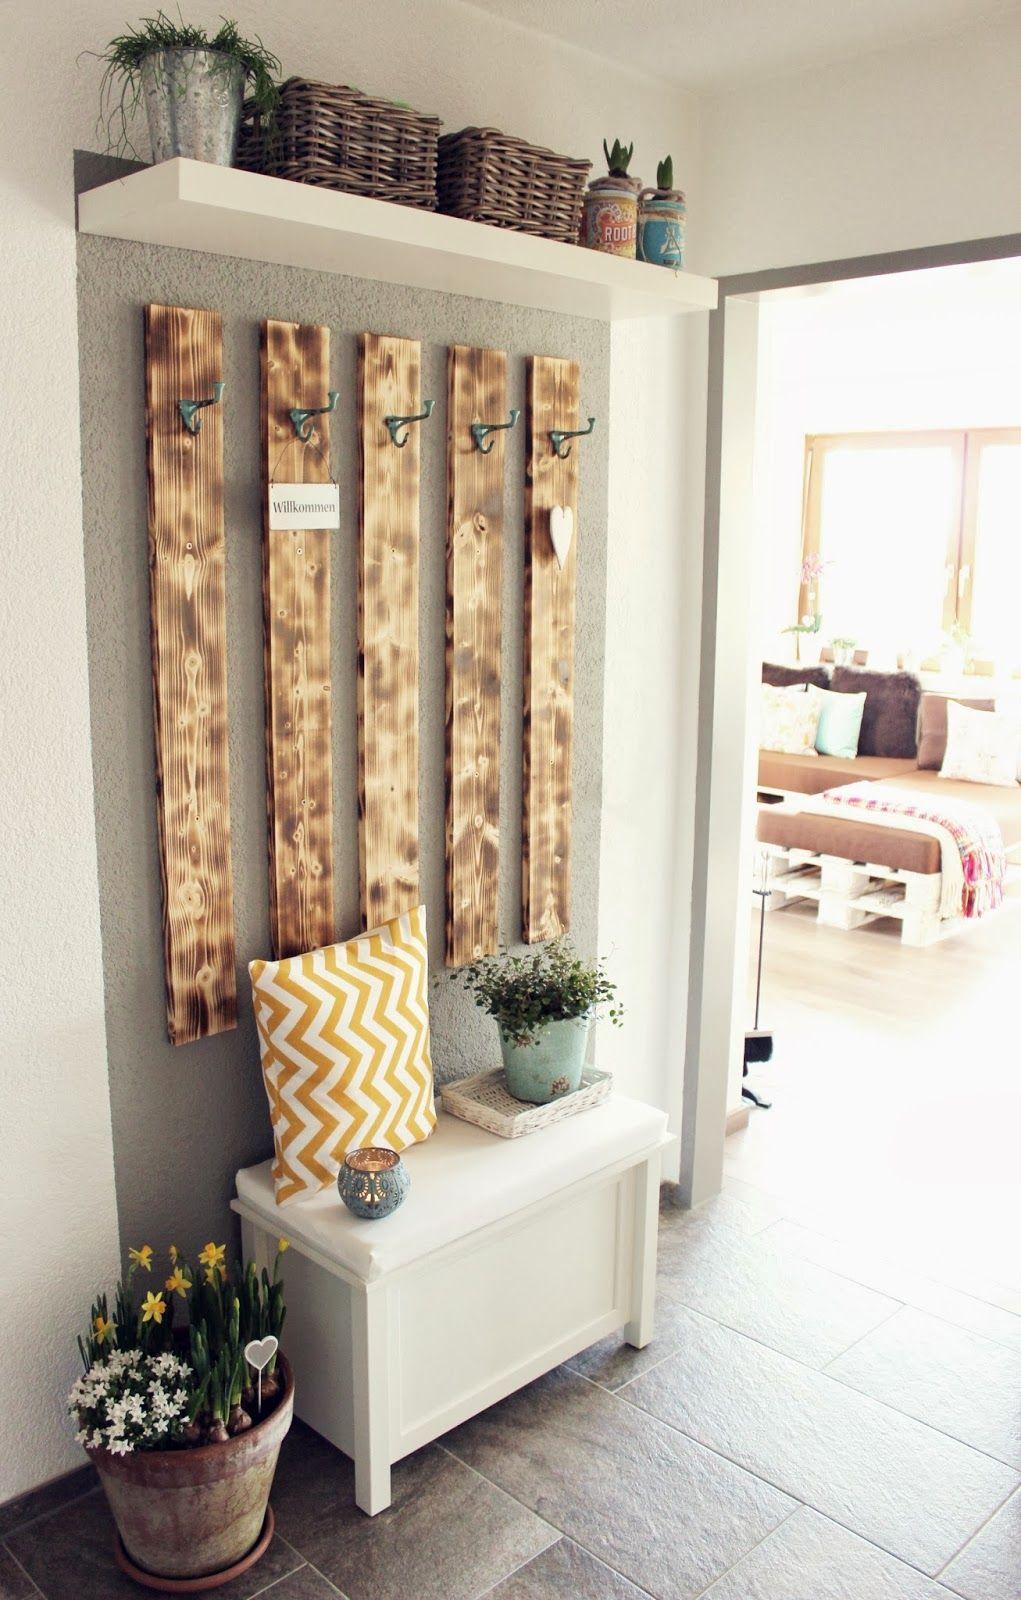 Haus außentor design diy garderobe subastelkistle  interiors house and room